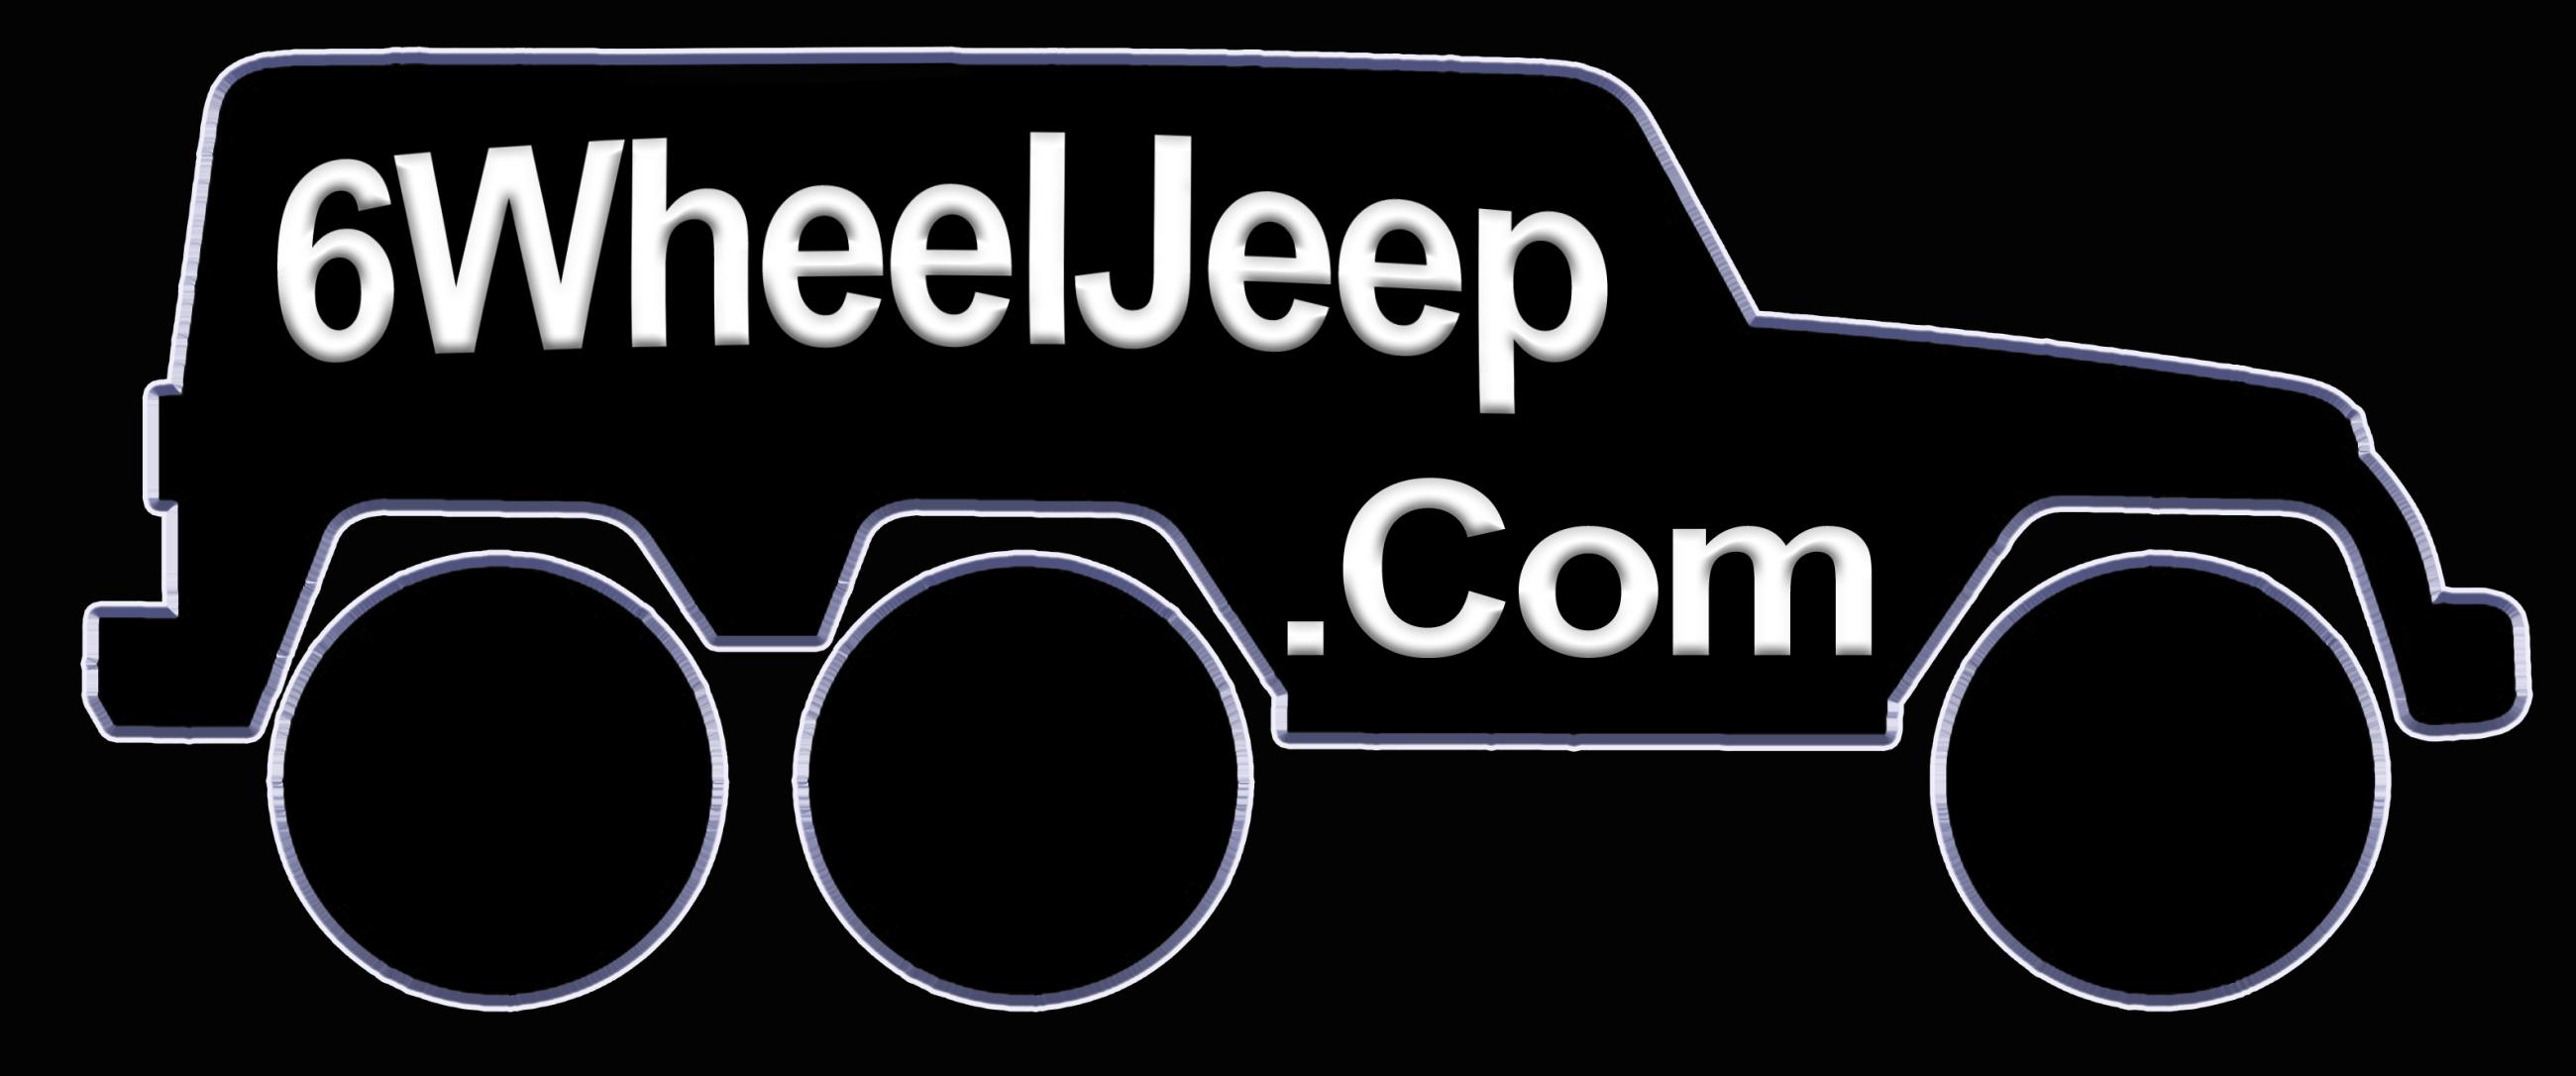 6 Wheel Jeep